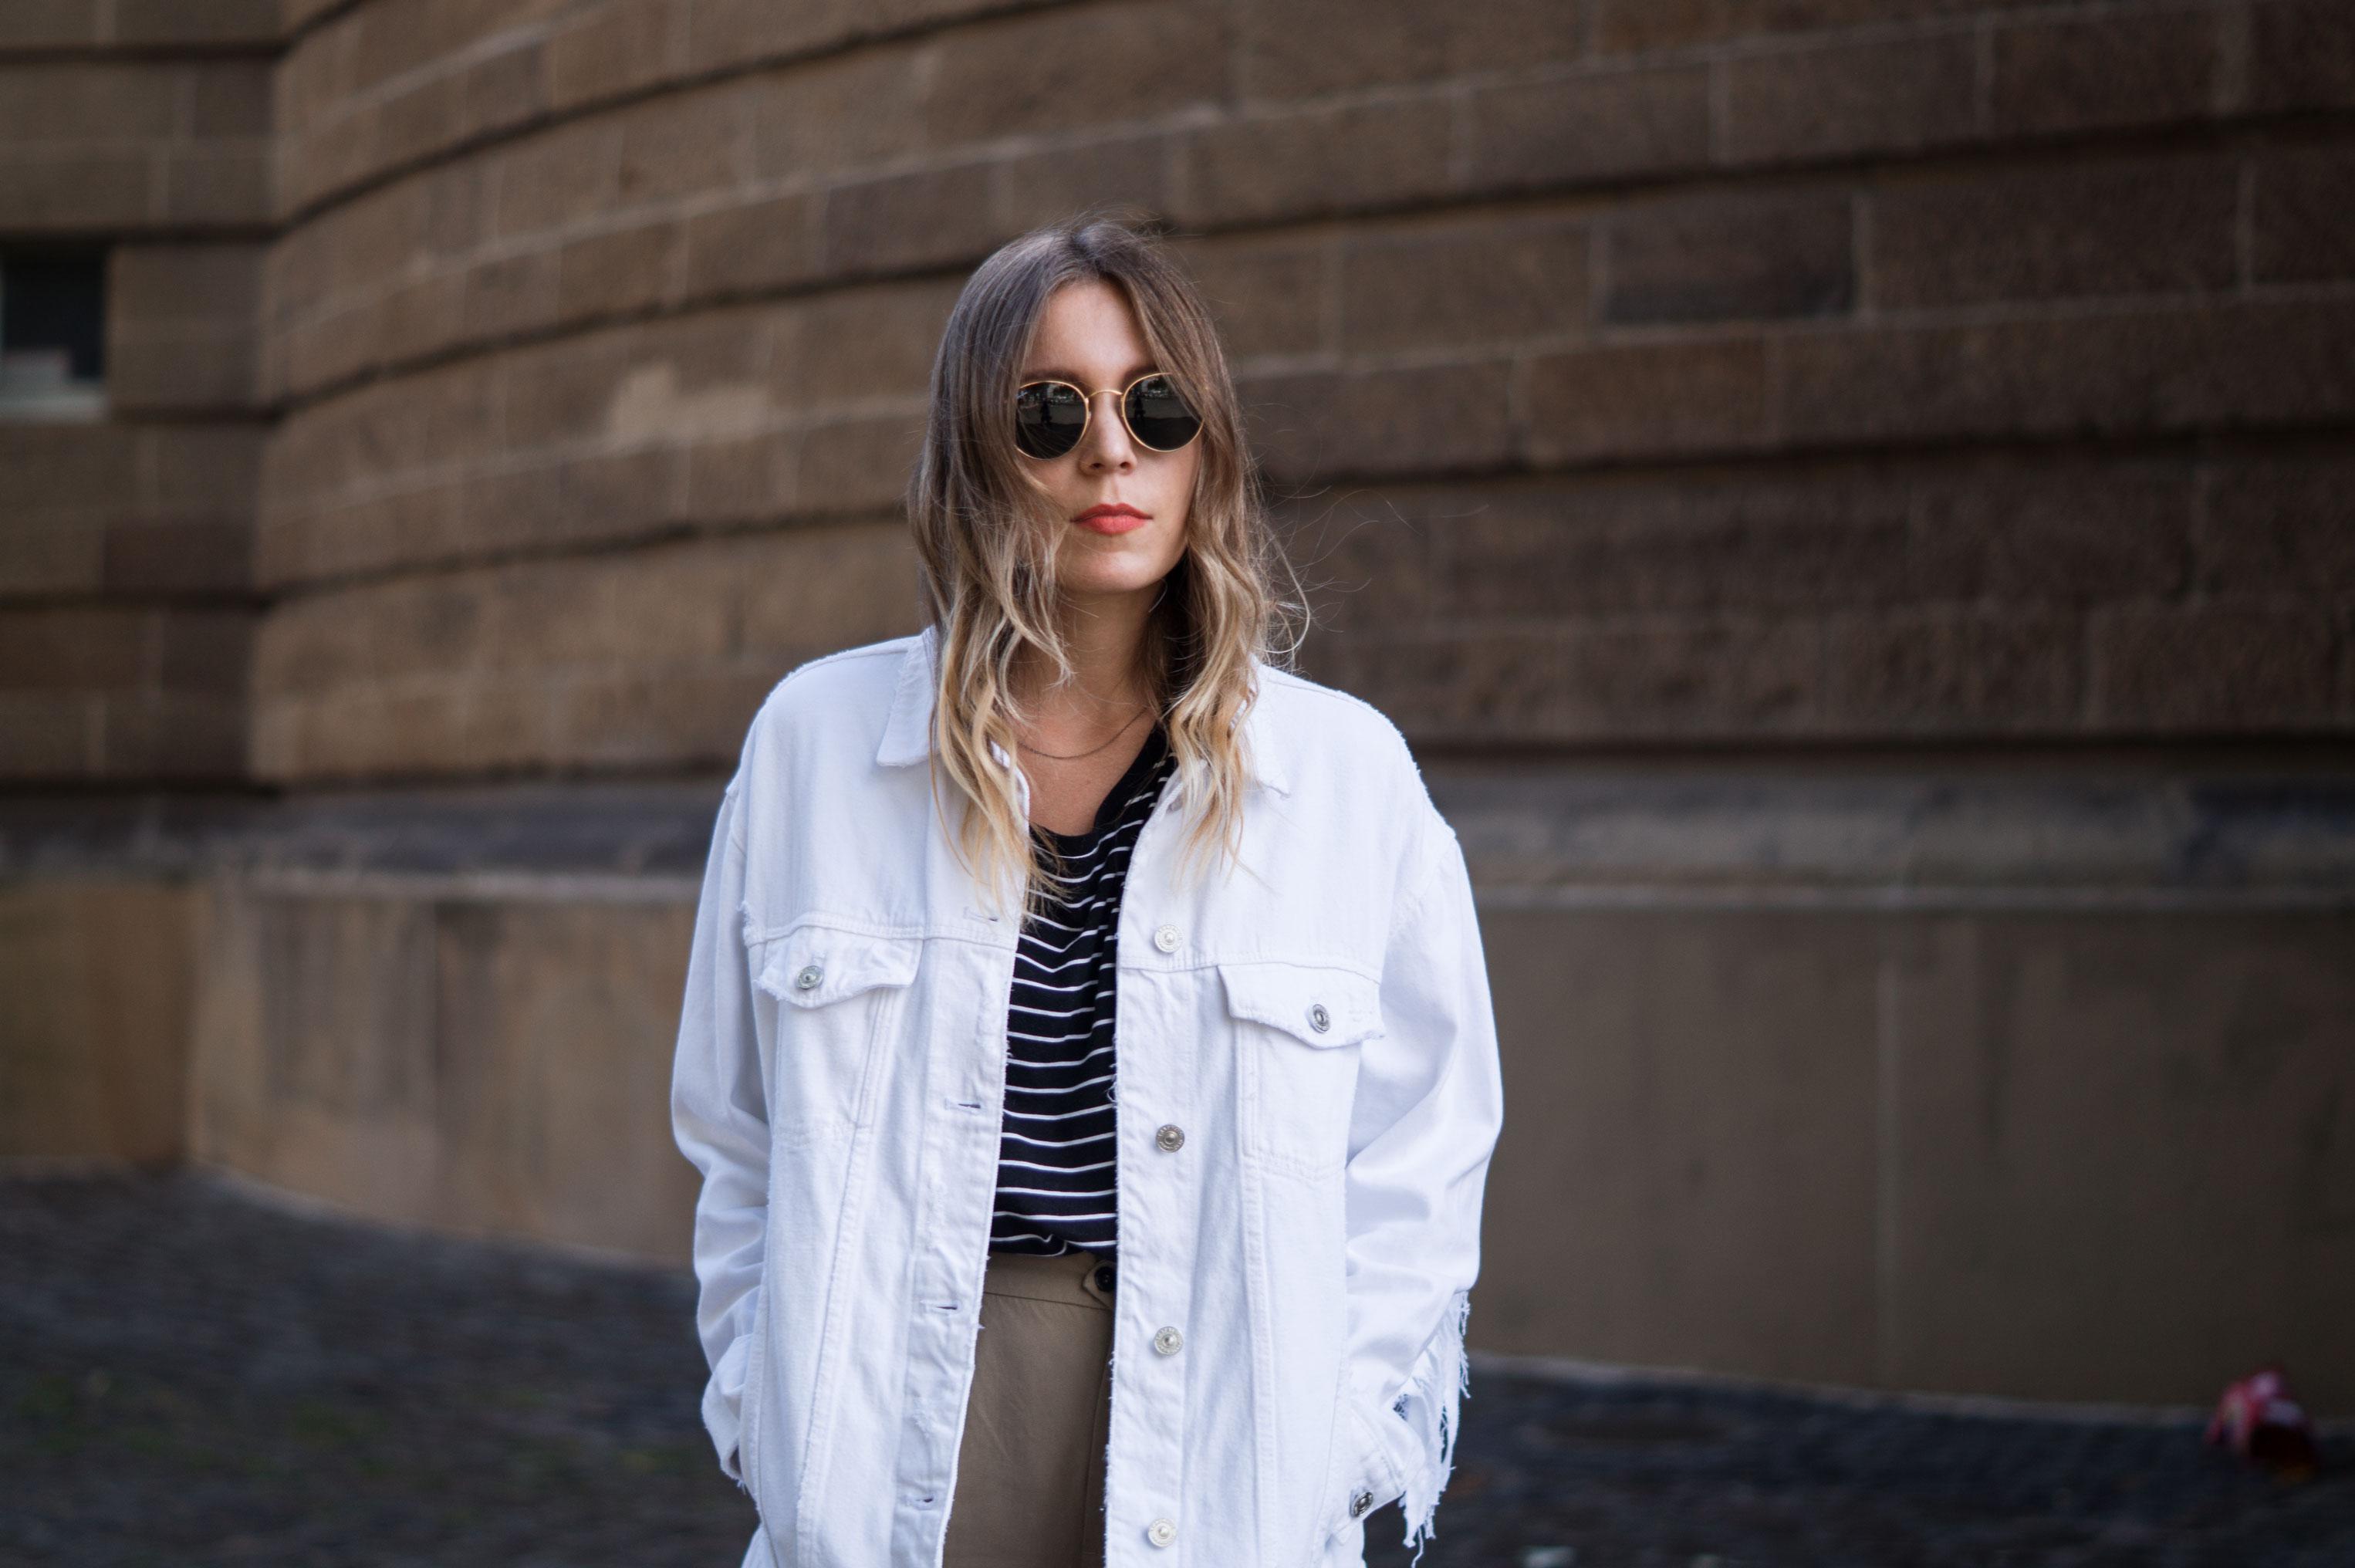 Fringed Denim Jacket Fransenjacke weiße Jeansjacke Casual Outfit Sariety Fashionblogger Modeblog Heidelberg Mannheim Wasserturm-2